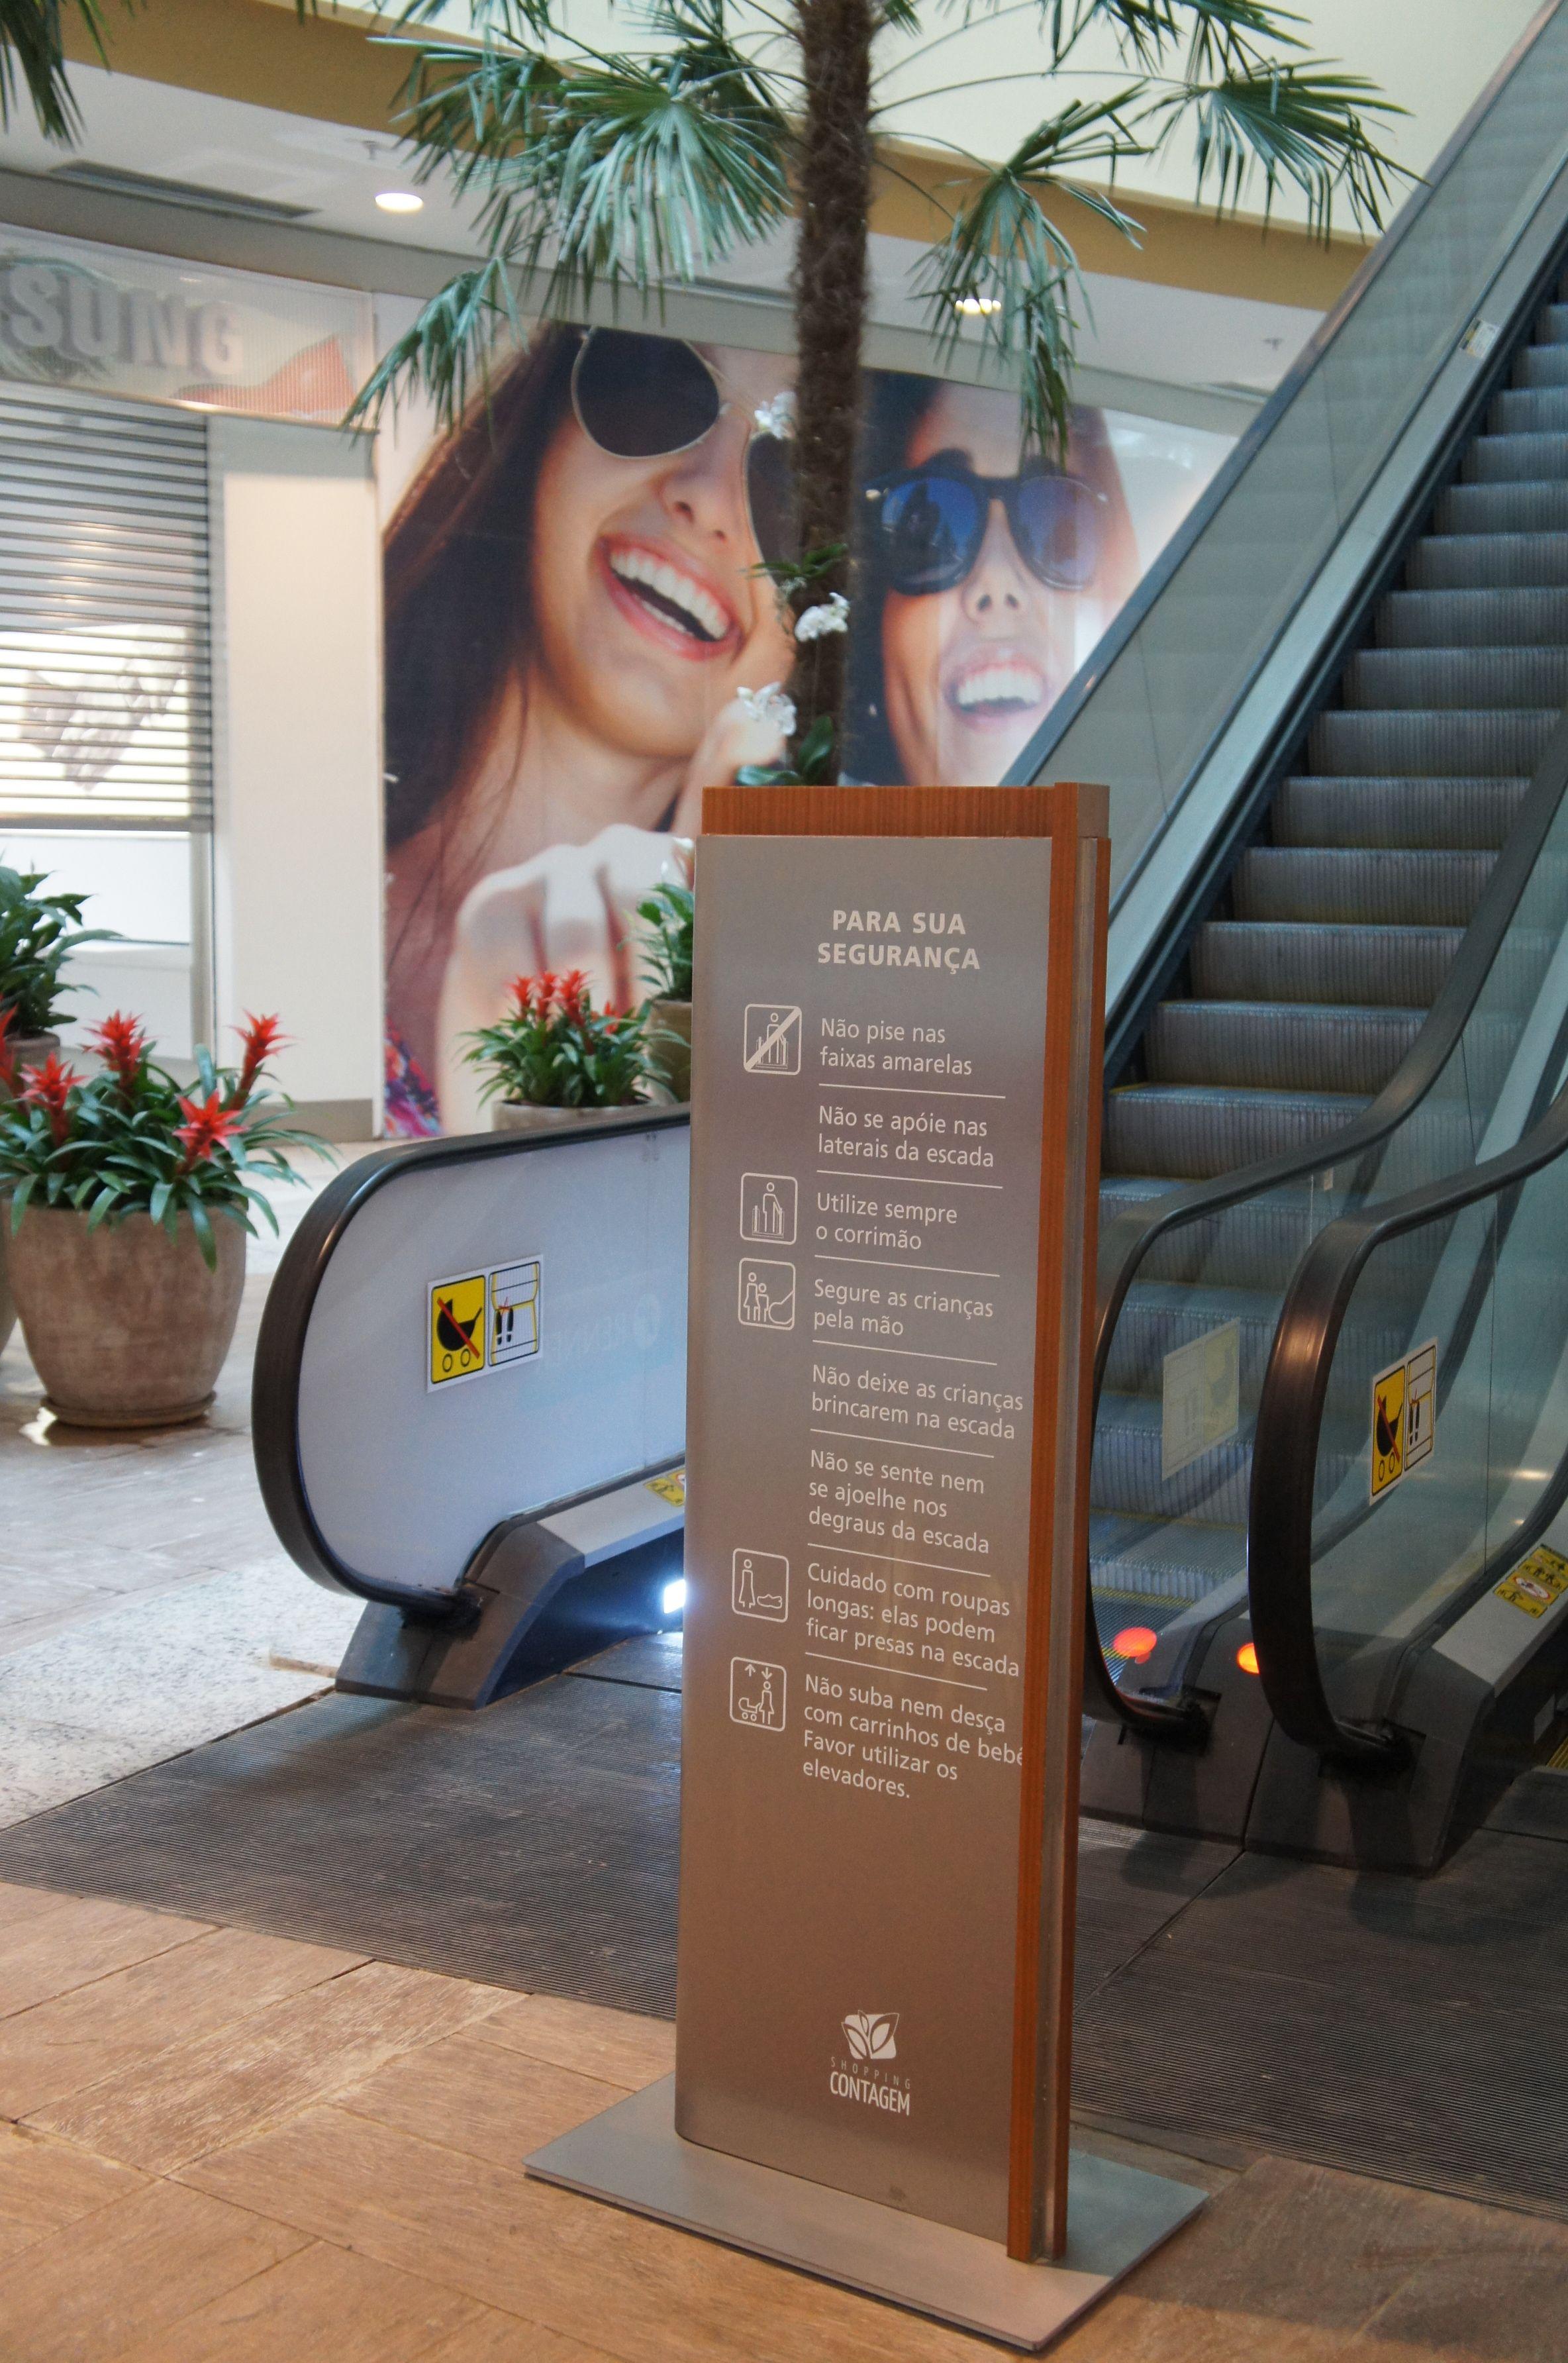 Wayfinding - Totem sign - Shopping Contagem - Contagem (MG) - Brazil # Brazilian design